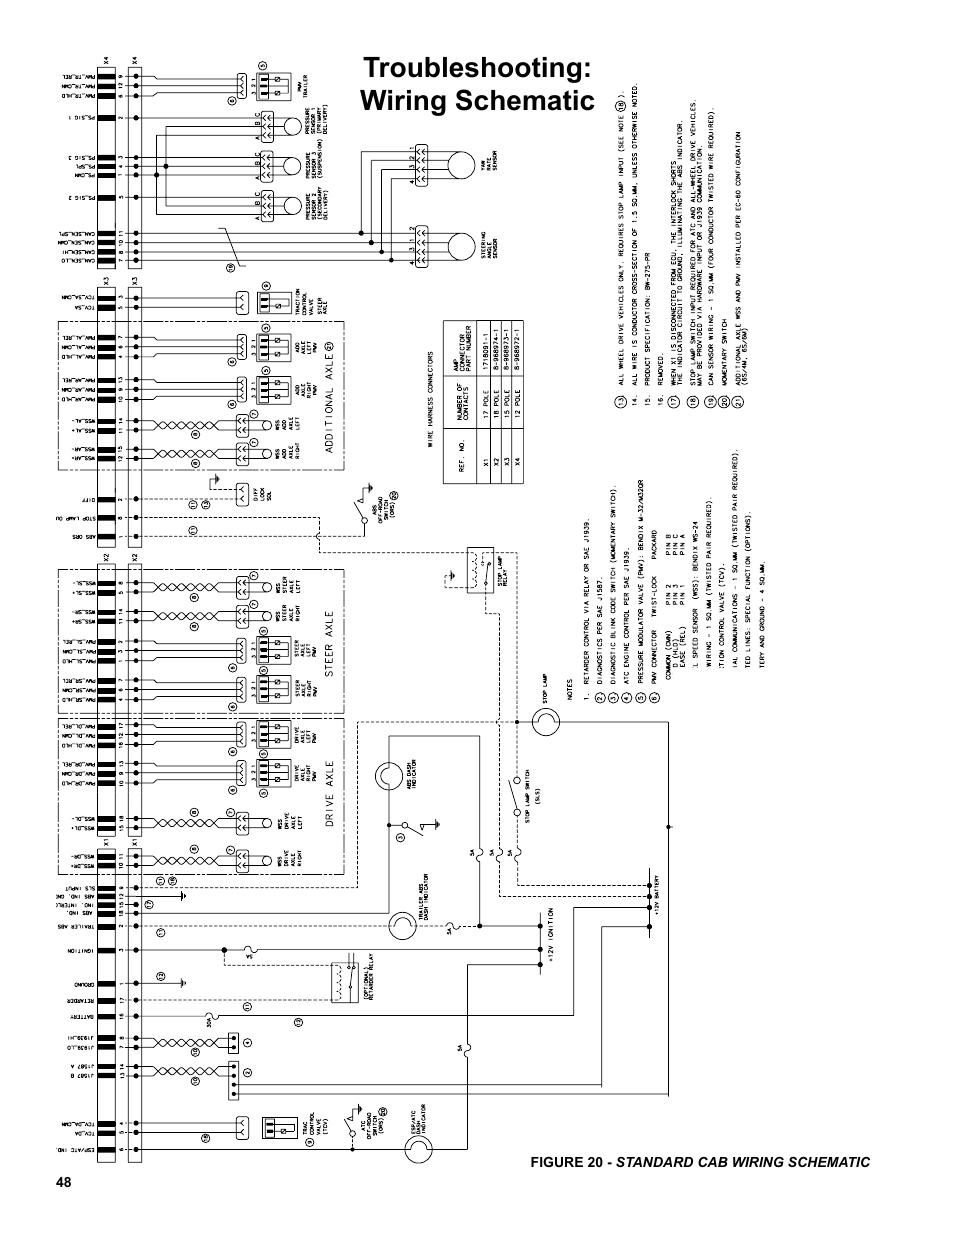 medium resolution of bendix 51b8 3 ac generator wiring diagrams wiring diagram bendix wiring diagram t300 kenworth bendix king